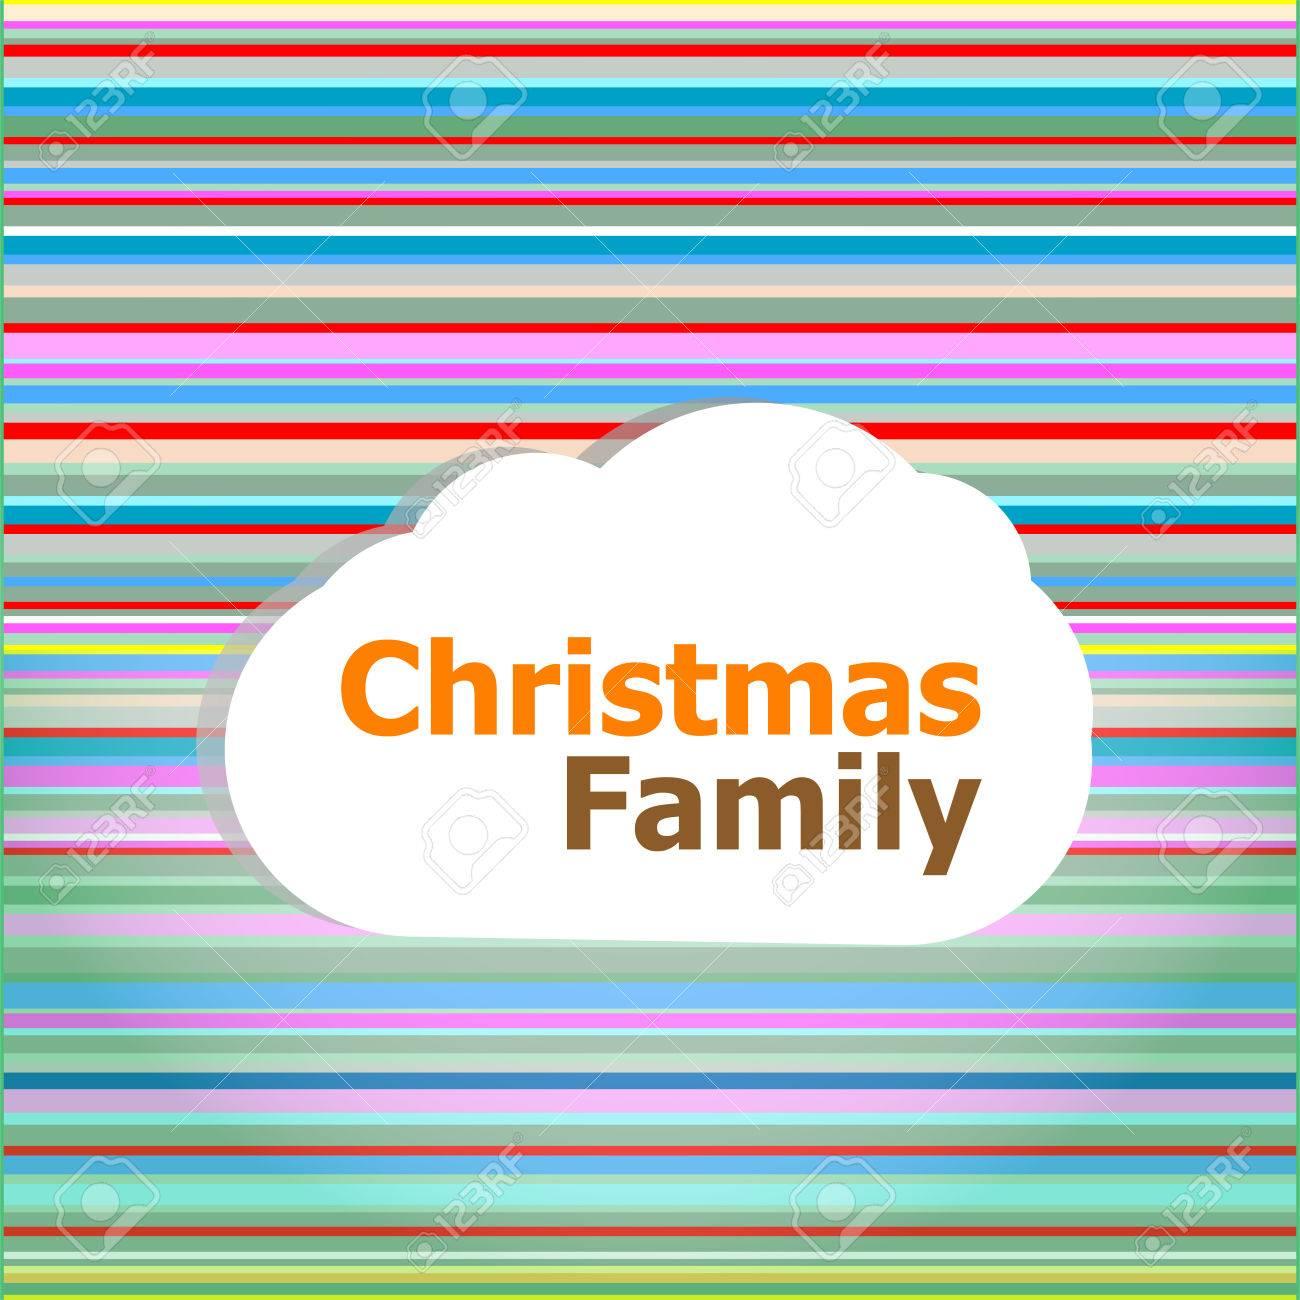 Carte Dinvitation De Noël Mot De Famille De Noël Sur Un Nuage